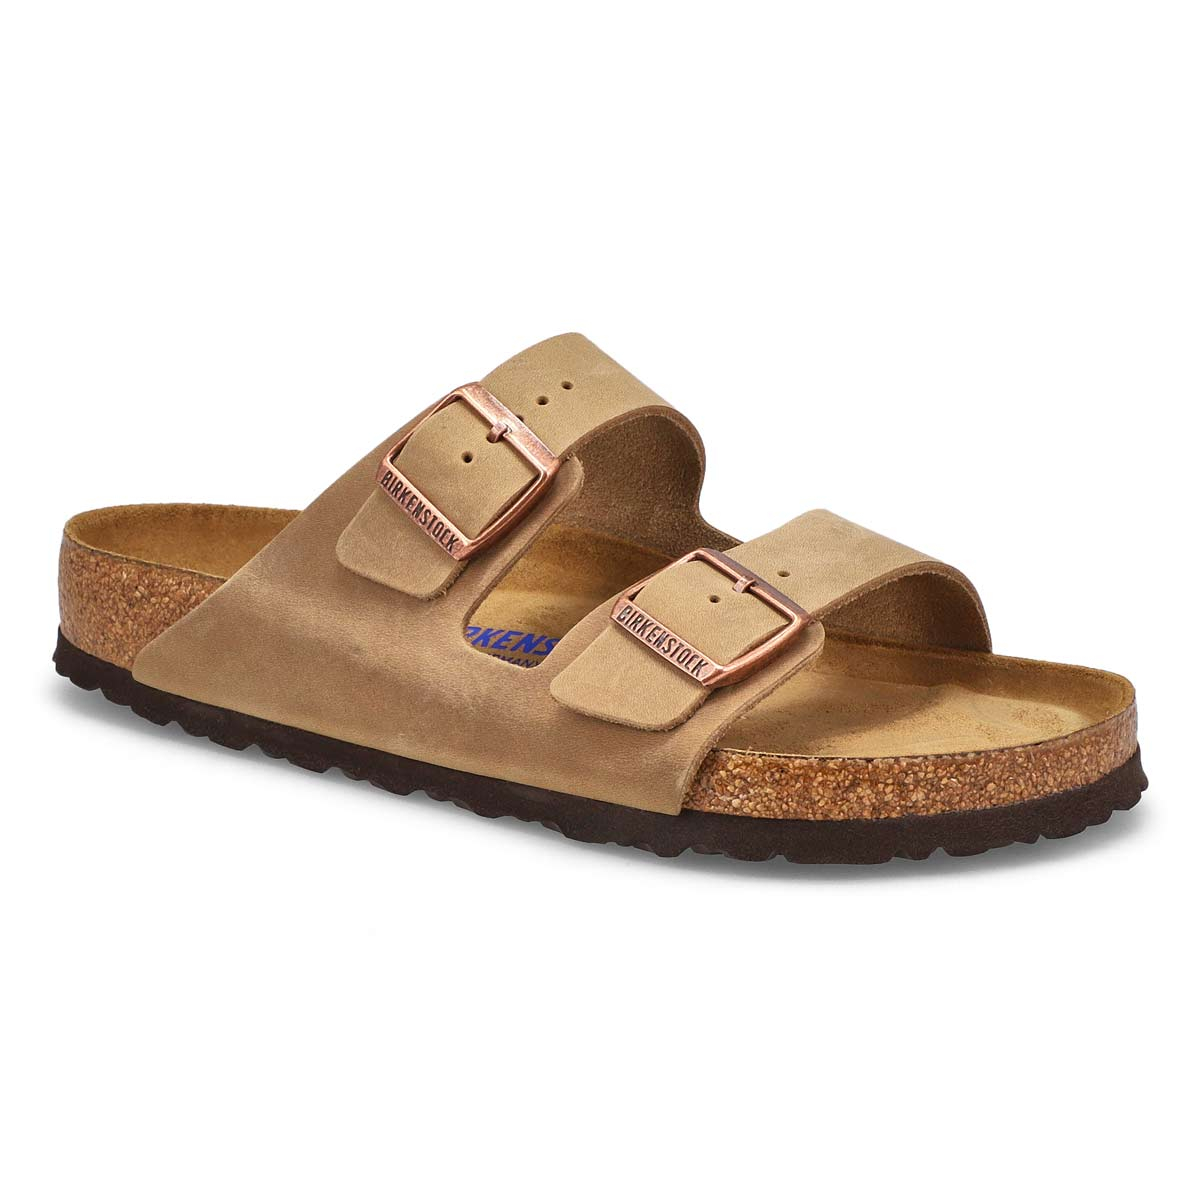 Men's ARIZONA SF tobacco 2 strap sandals